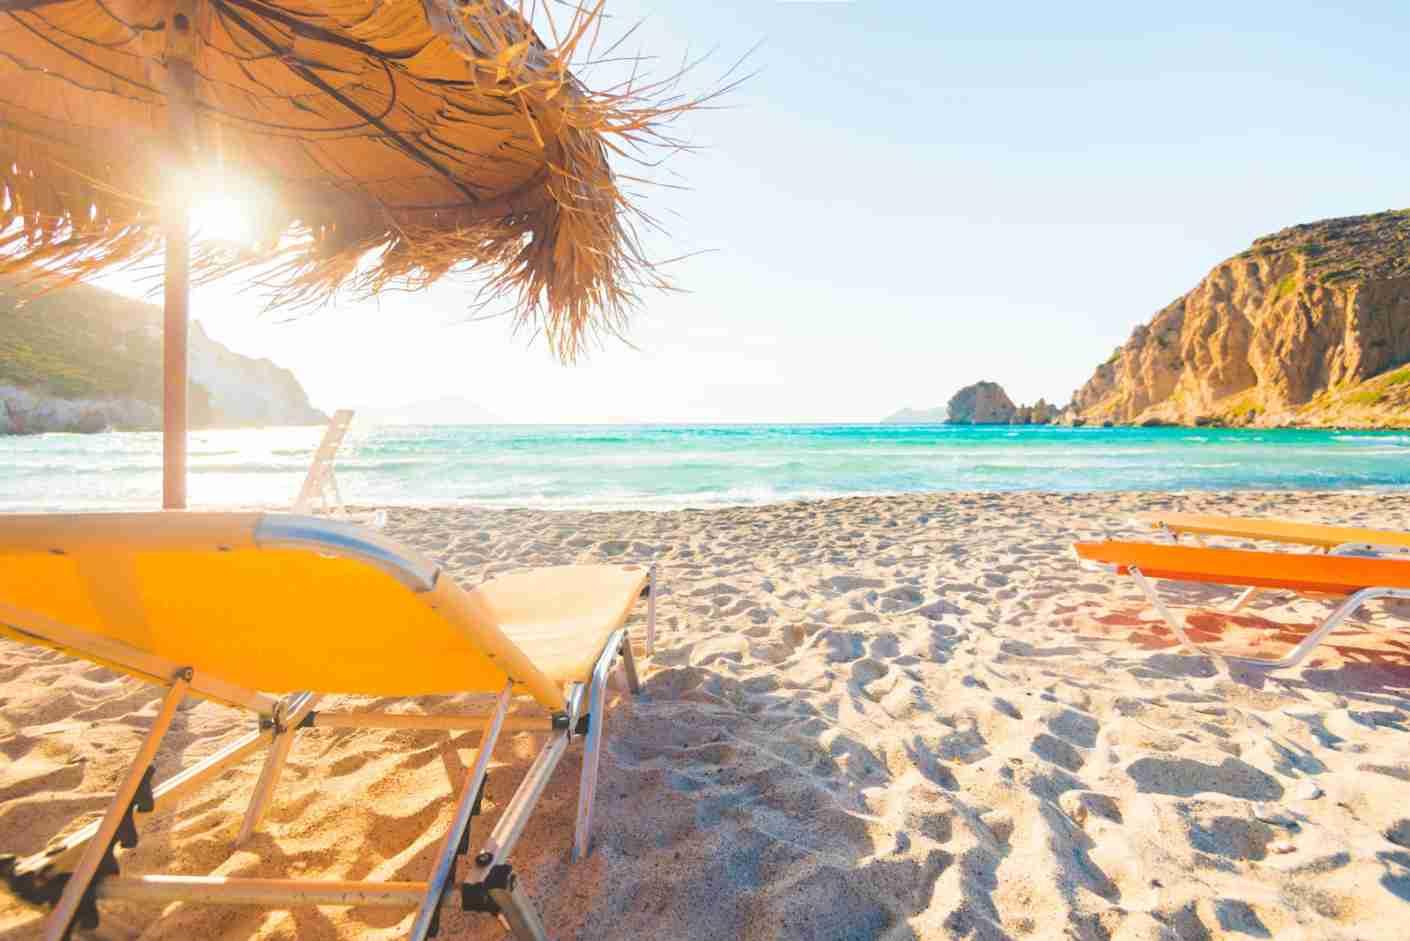 Sunset in Plathiena, a wonderful beach in Milos, Cyclades Islands, Greece